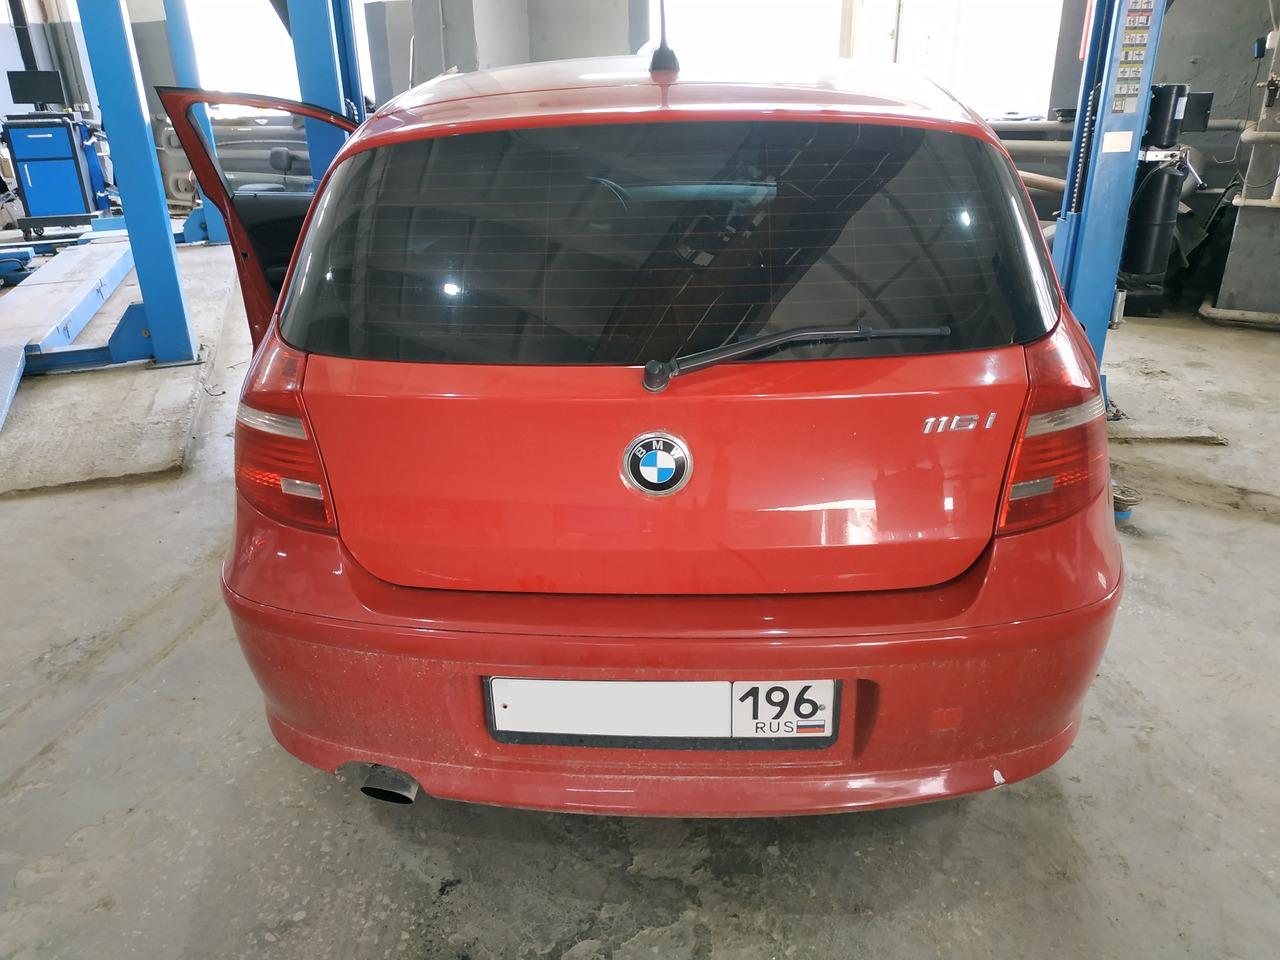 BMW E87 116i 2011, вид сзади